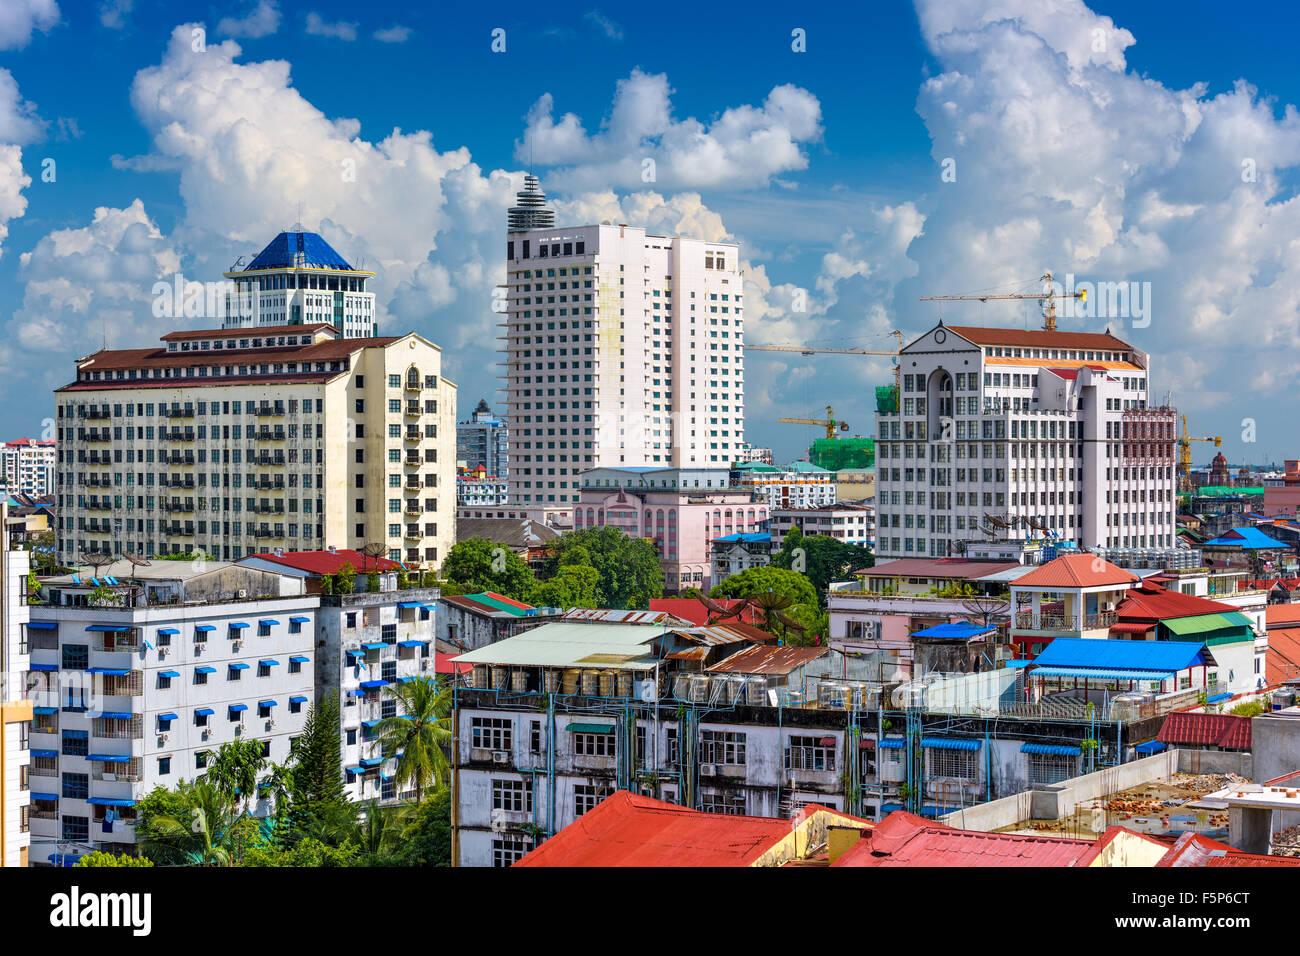 Yangon, Myanmar downtown core skyline. Immagini Stock